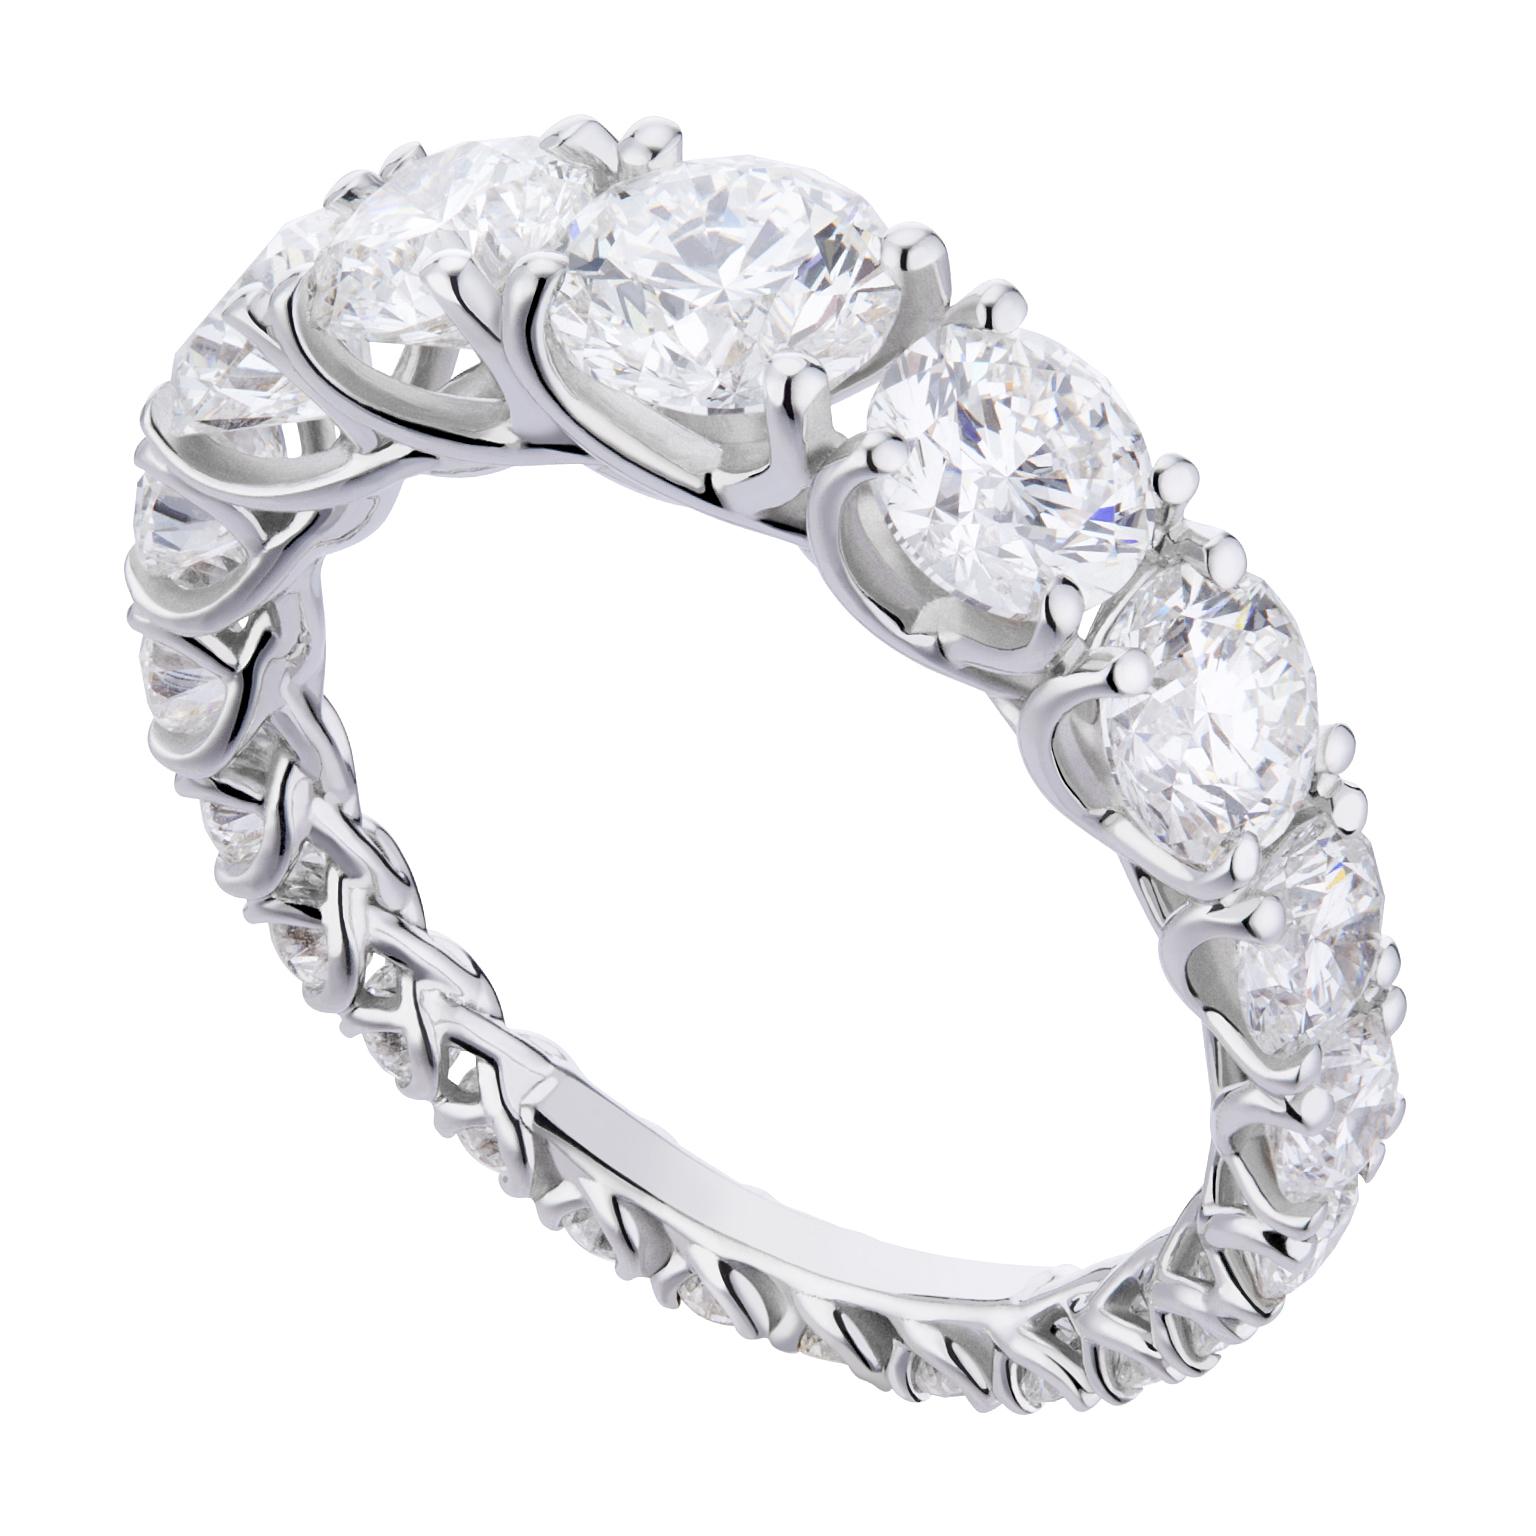 ANELLO ETERNITY GRACE A SCALARE, World Diamond Group